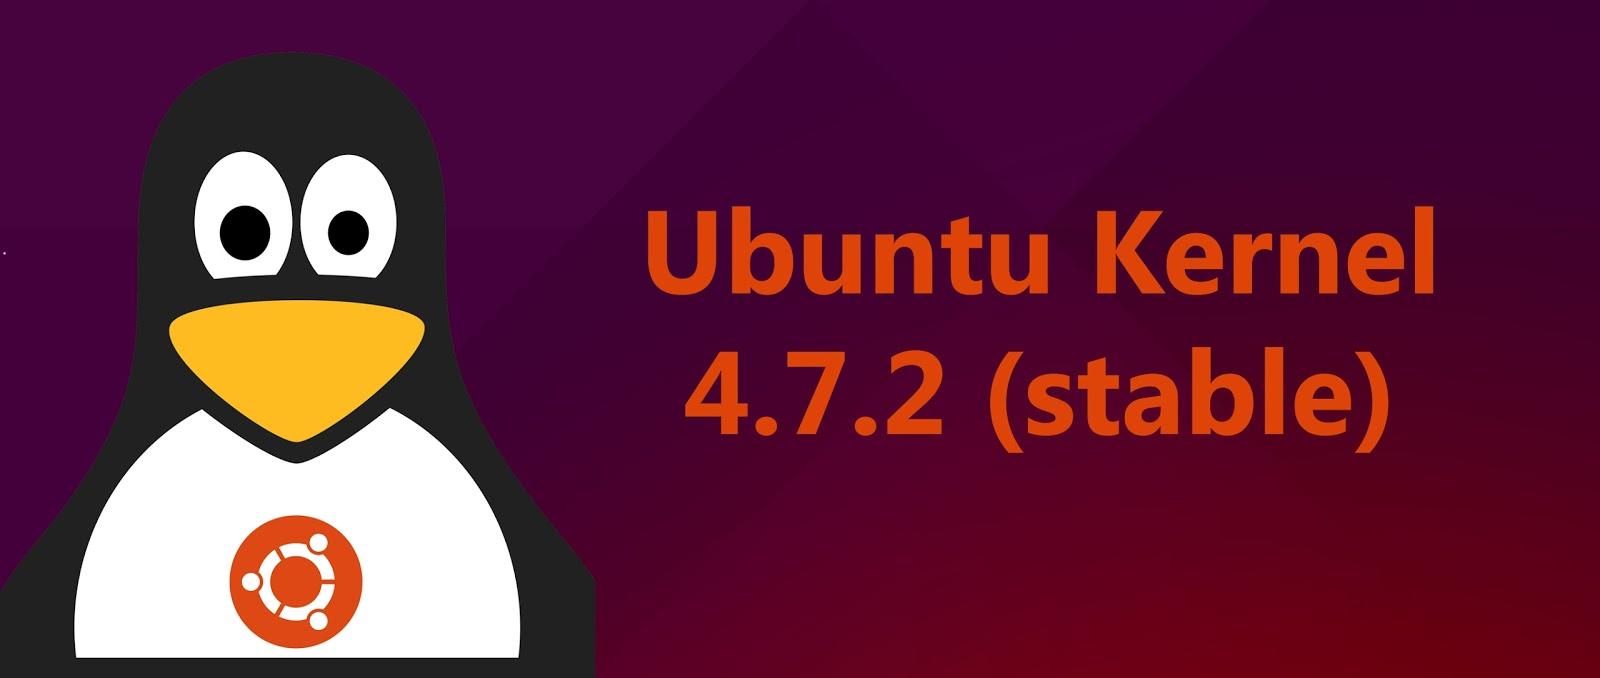 Как установить ядро Linux 4.7.2 на Ubuntu 16.04 LTS